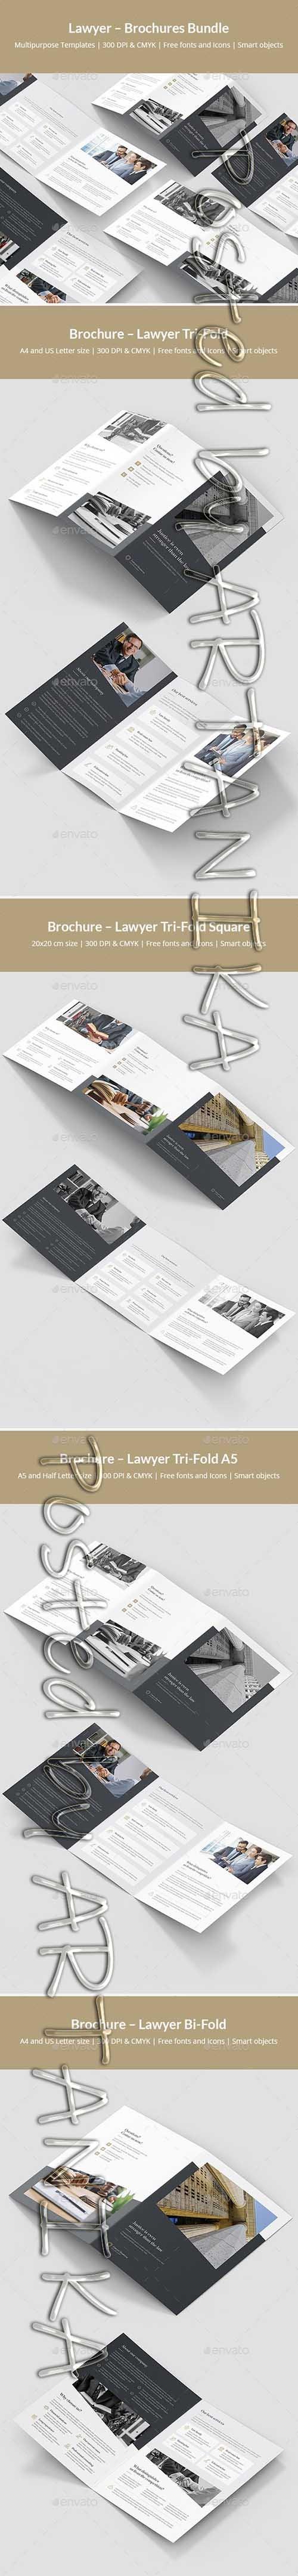 Lawyer Brochures Bundle Print Templates 5 in 1 24245507